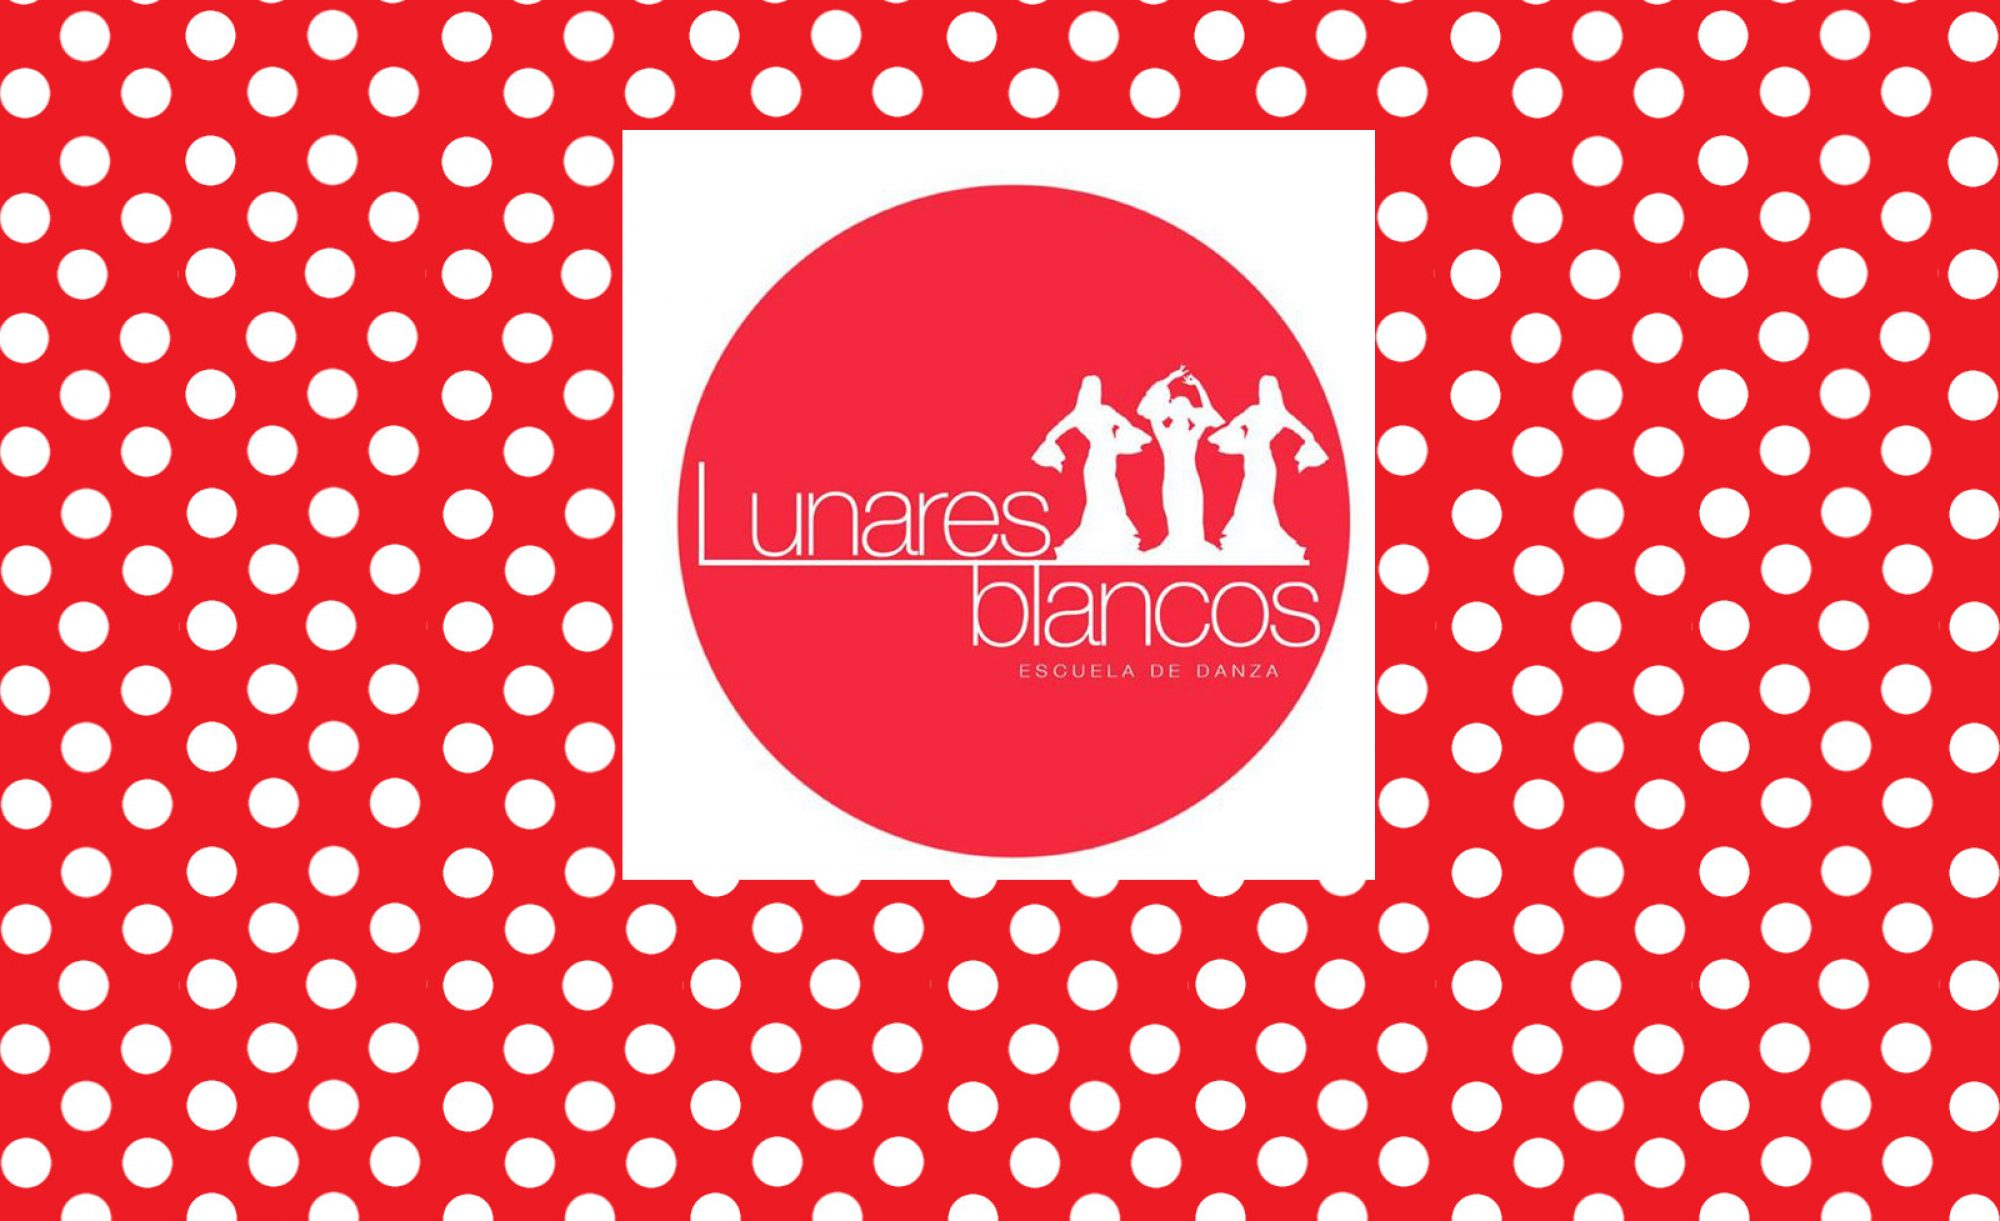 Lunares Blancos